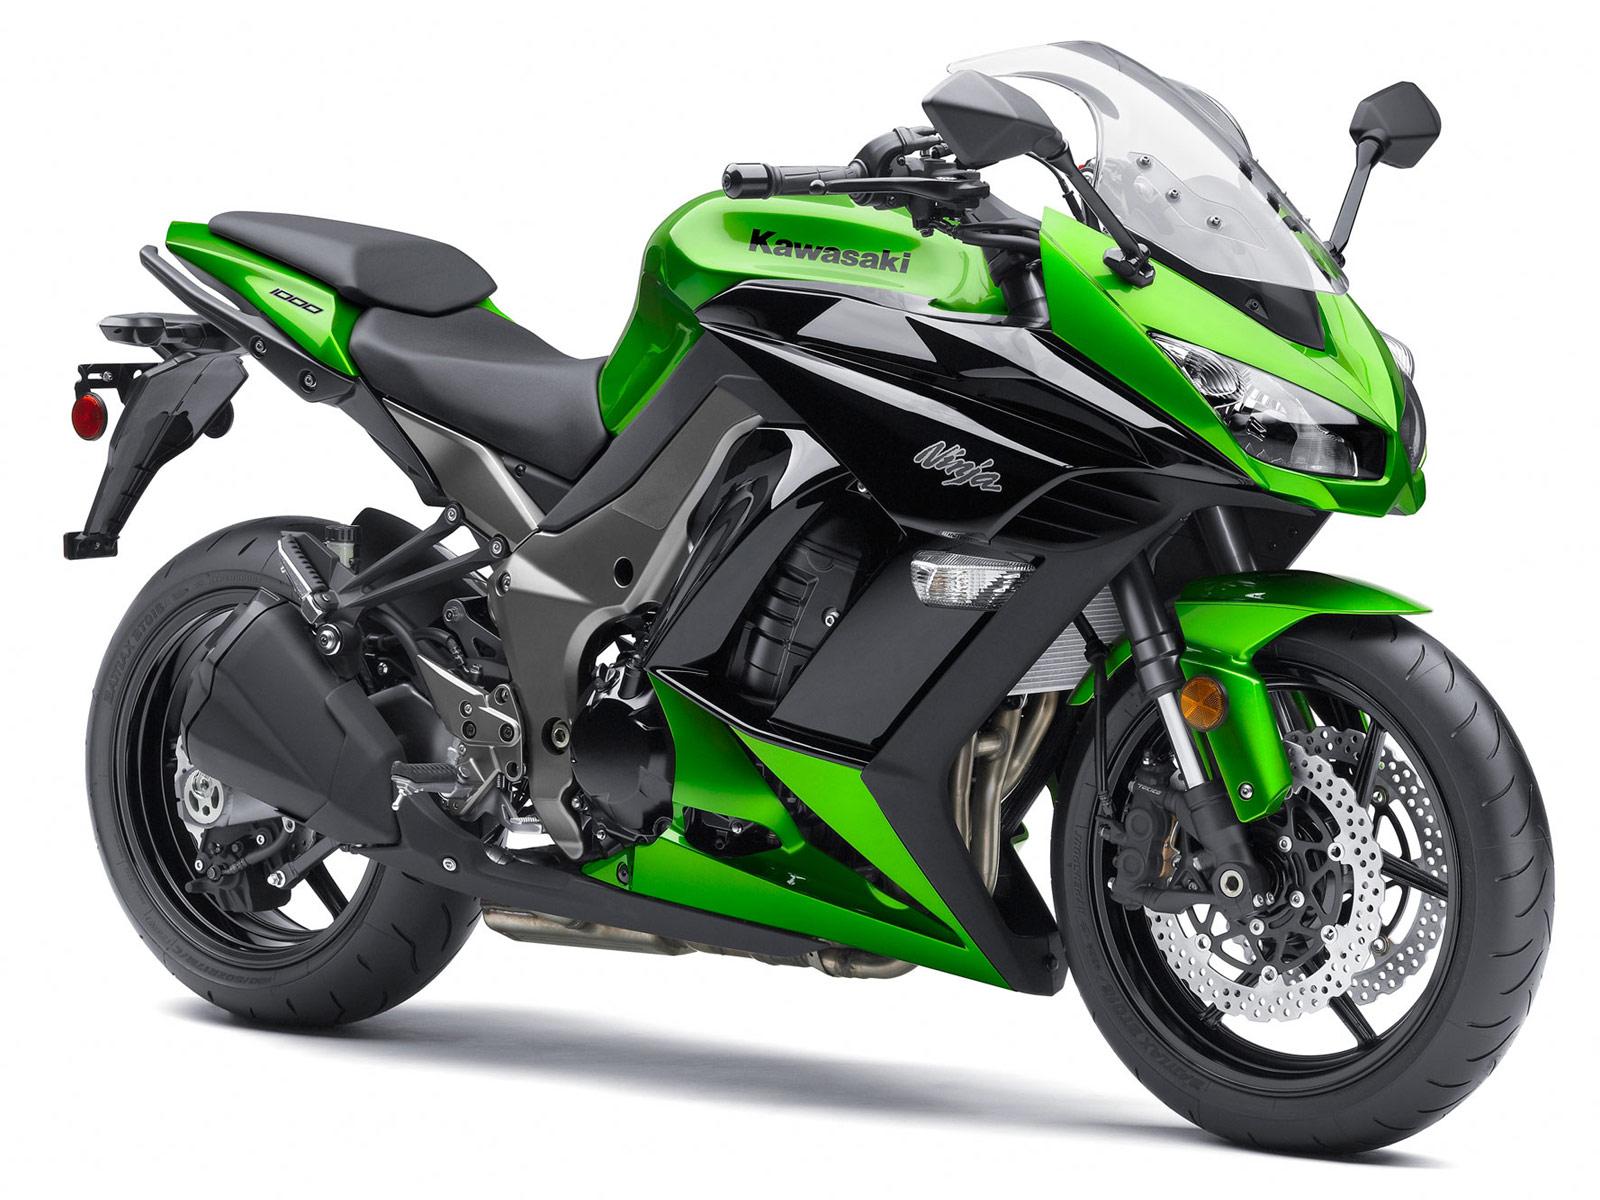 http://4.bp.blogspot.com/-YpcBCE4YlSQ/TwwM9kqOEFI/AAAAAAAAKE8/q2MVzTkhz7g/s1600/2012-Kawasaki-Ninja-1000-ABS_motorcycle-desktop-wallpaper_3.jpg